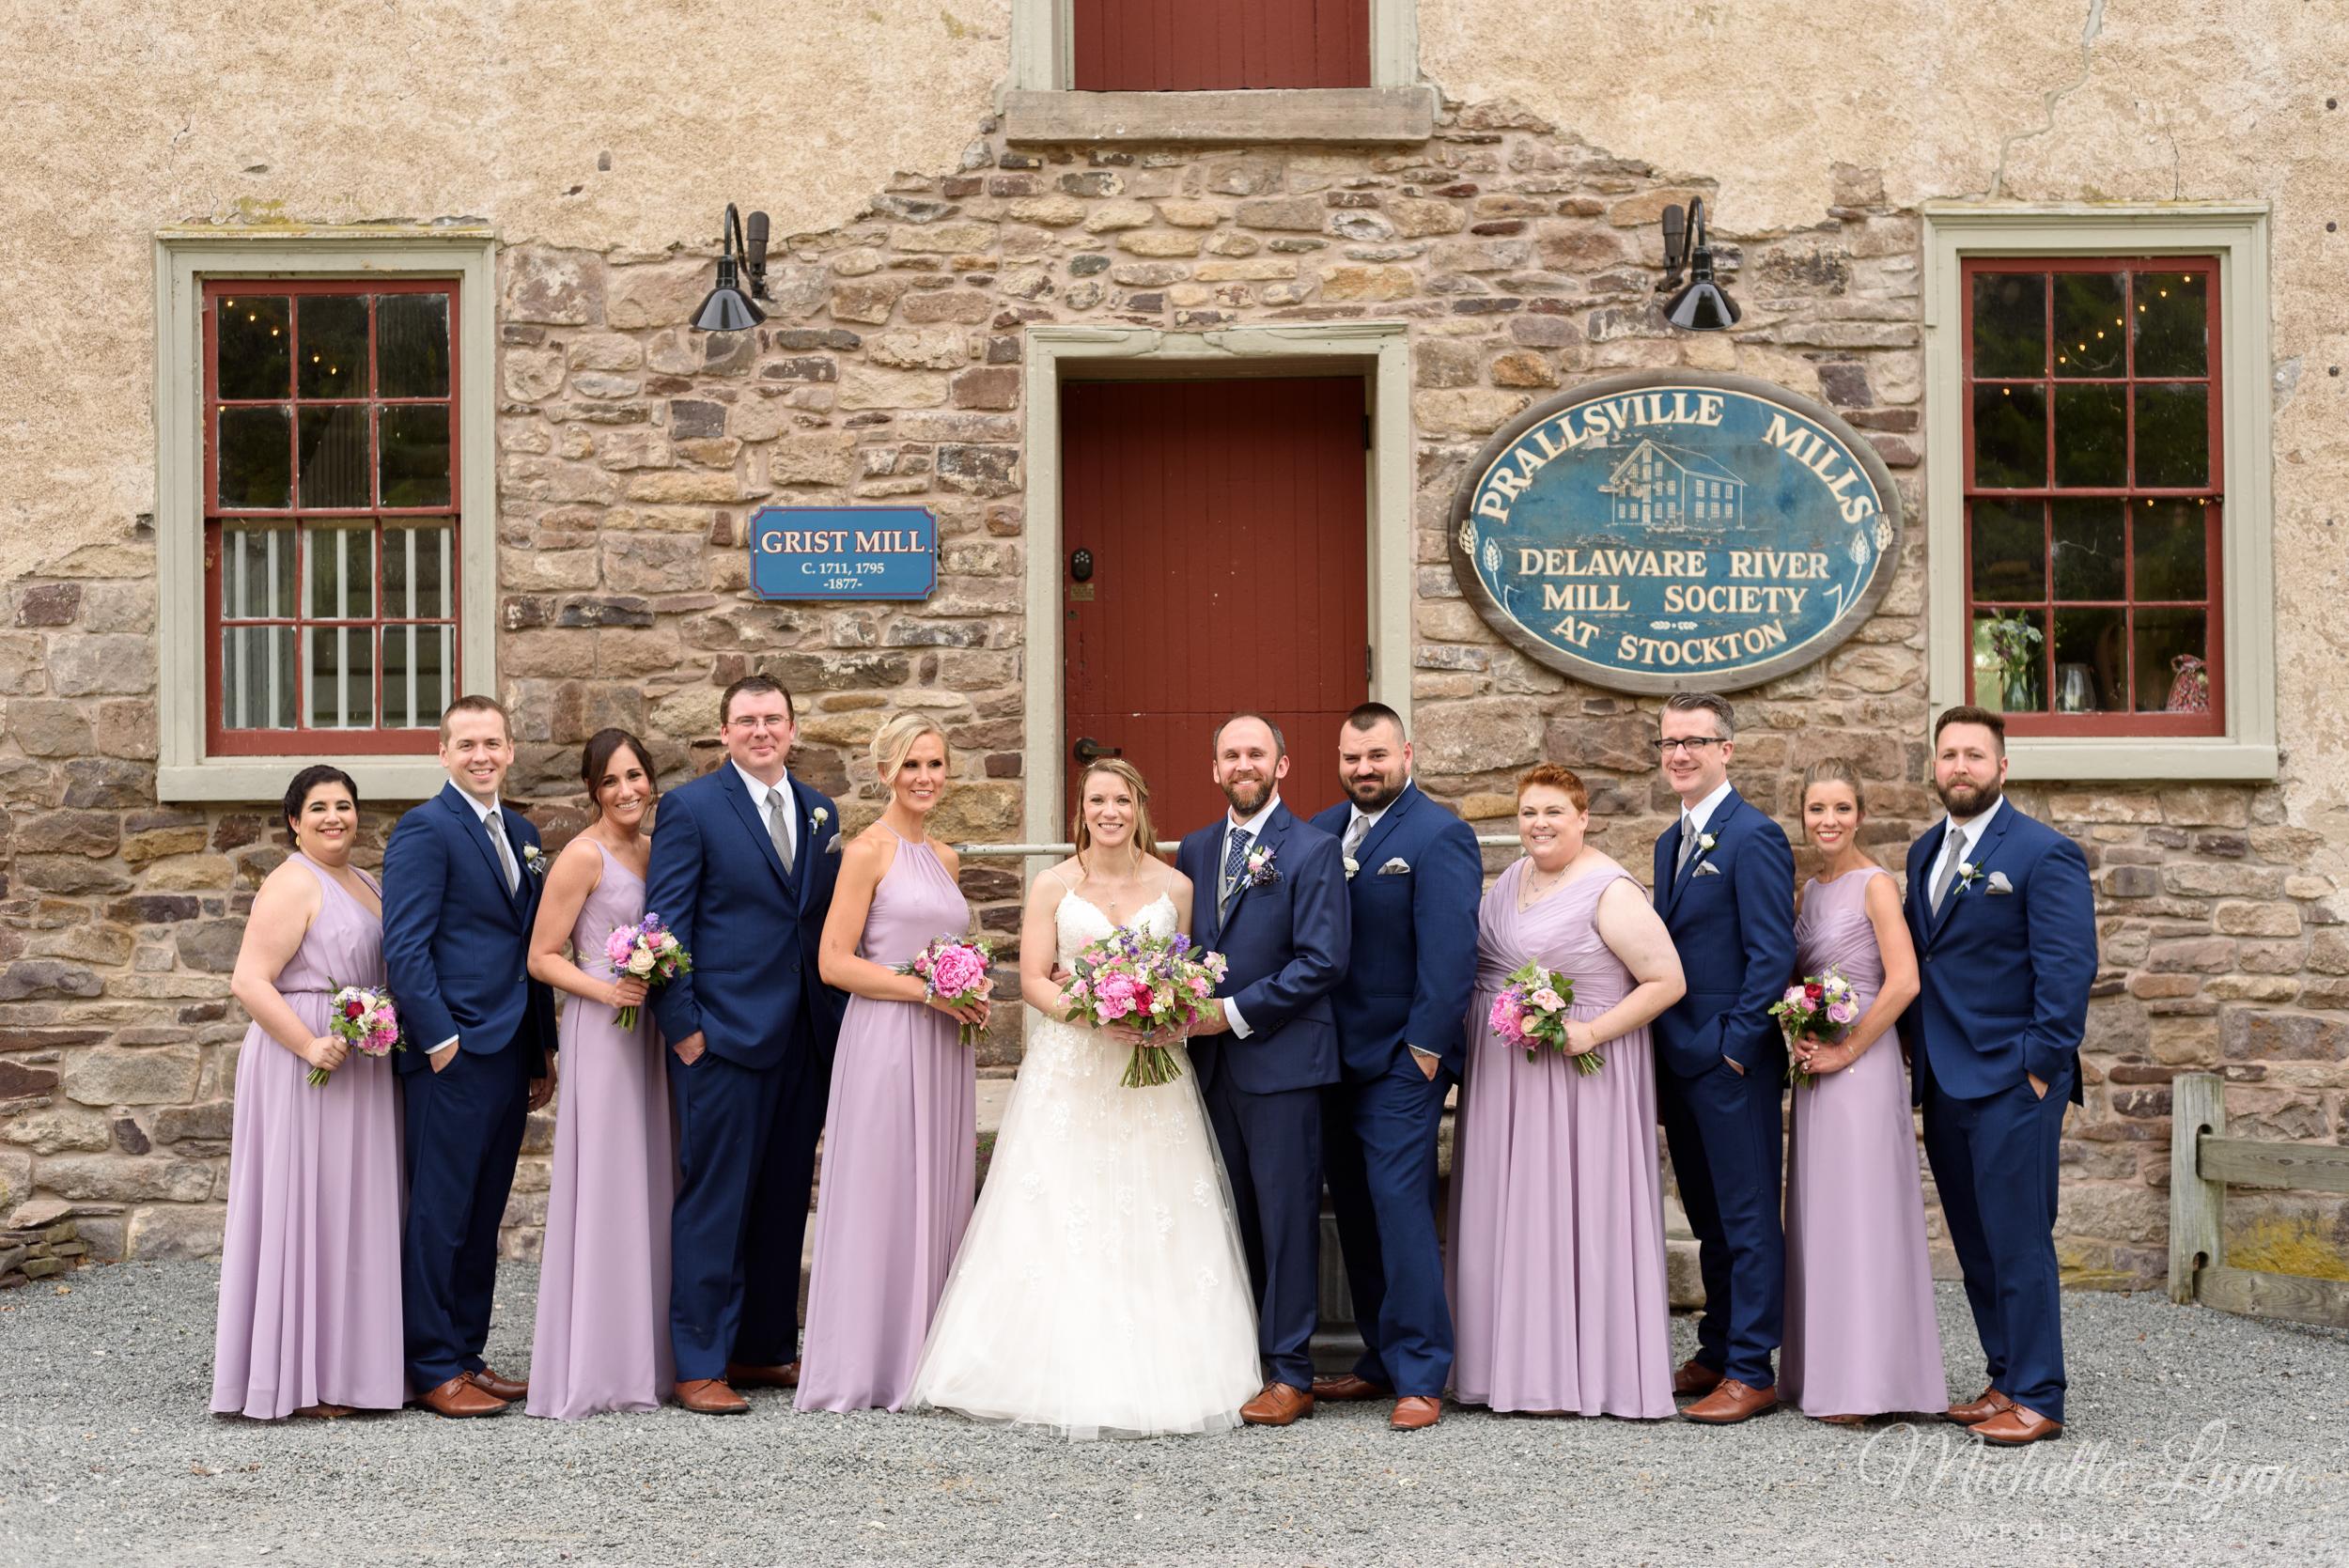 mlw-prallsville-mills-nj-wedding-photographer-43.jpg